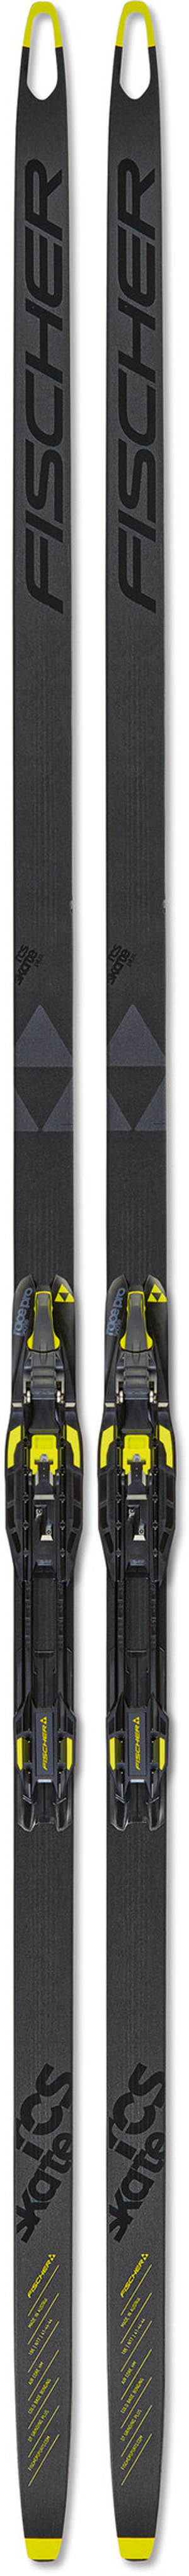 RCS Skate Plus Stiff inkl. Race Skate